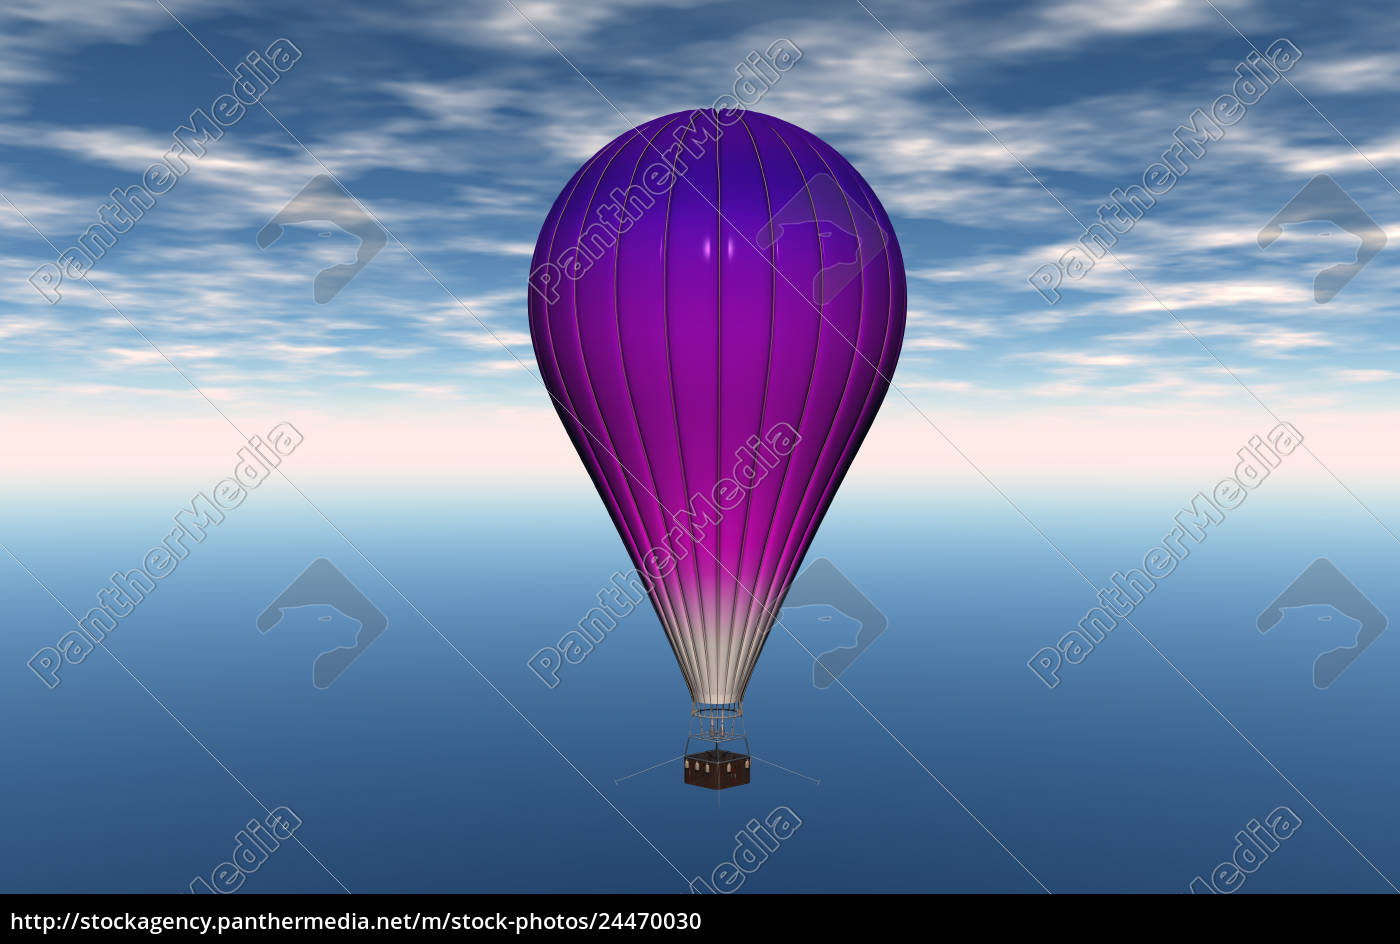 heiluftballon, mit, transportkorb, am, himmel - 24470030